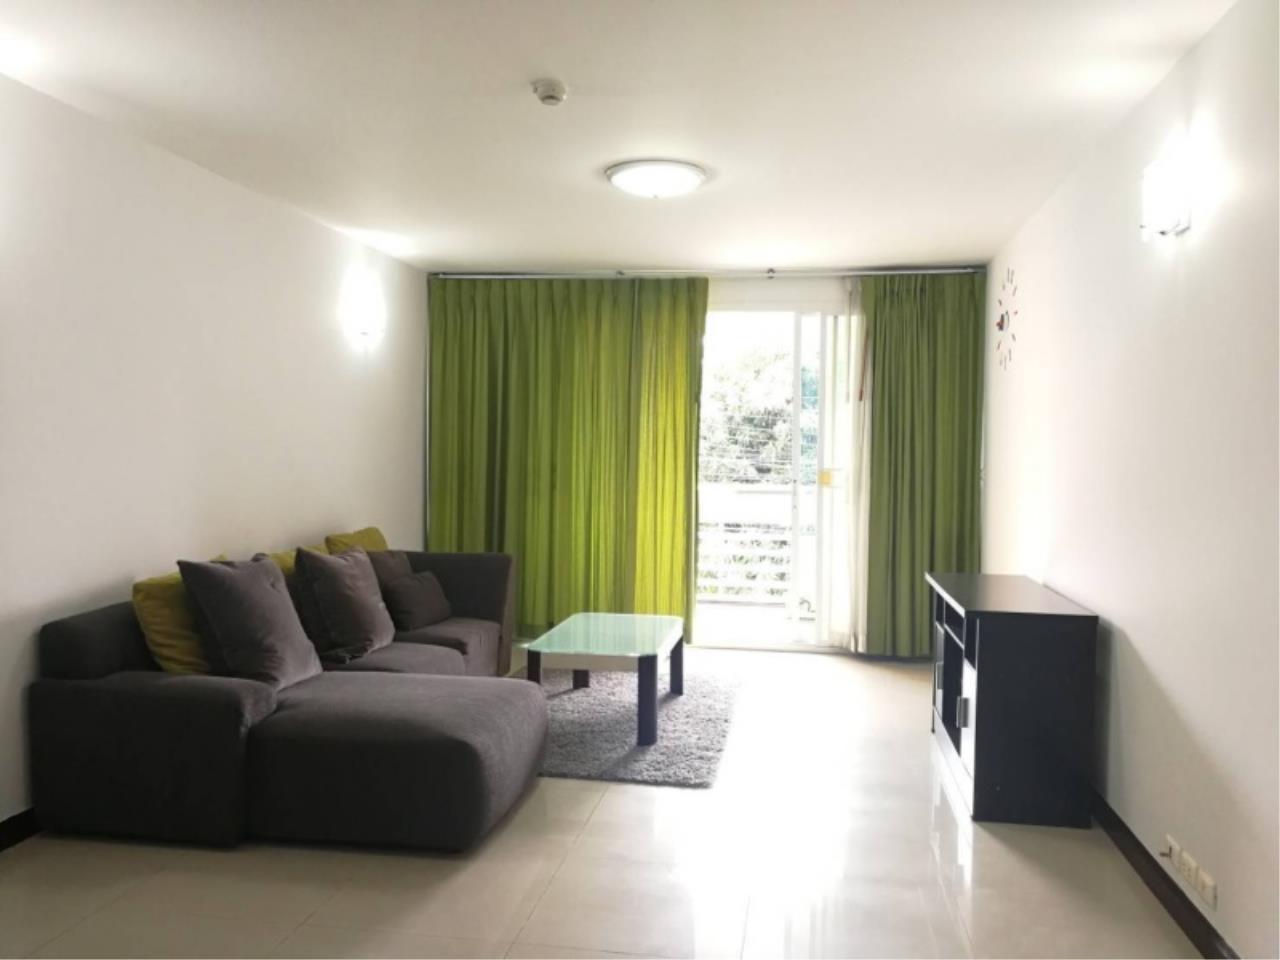 Century21 Skylux Agency's Fragrant 71 / Condo For Rent / 2 Bedroom / 112 SQM / BTS Phra Khanong / Bangkok 1